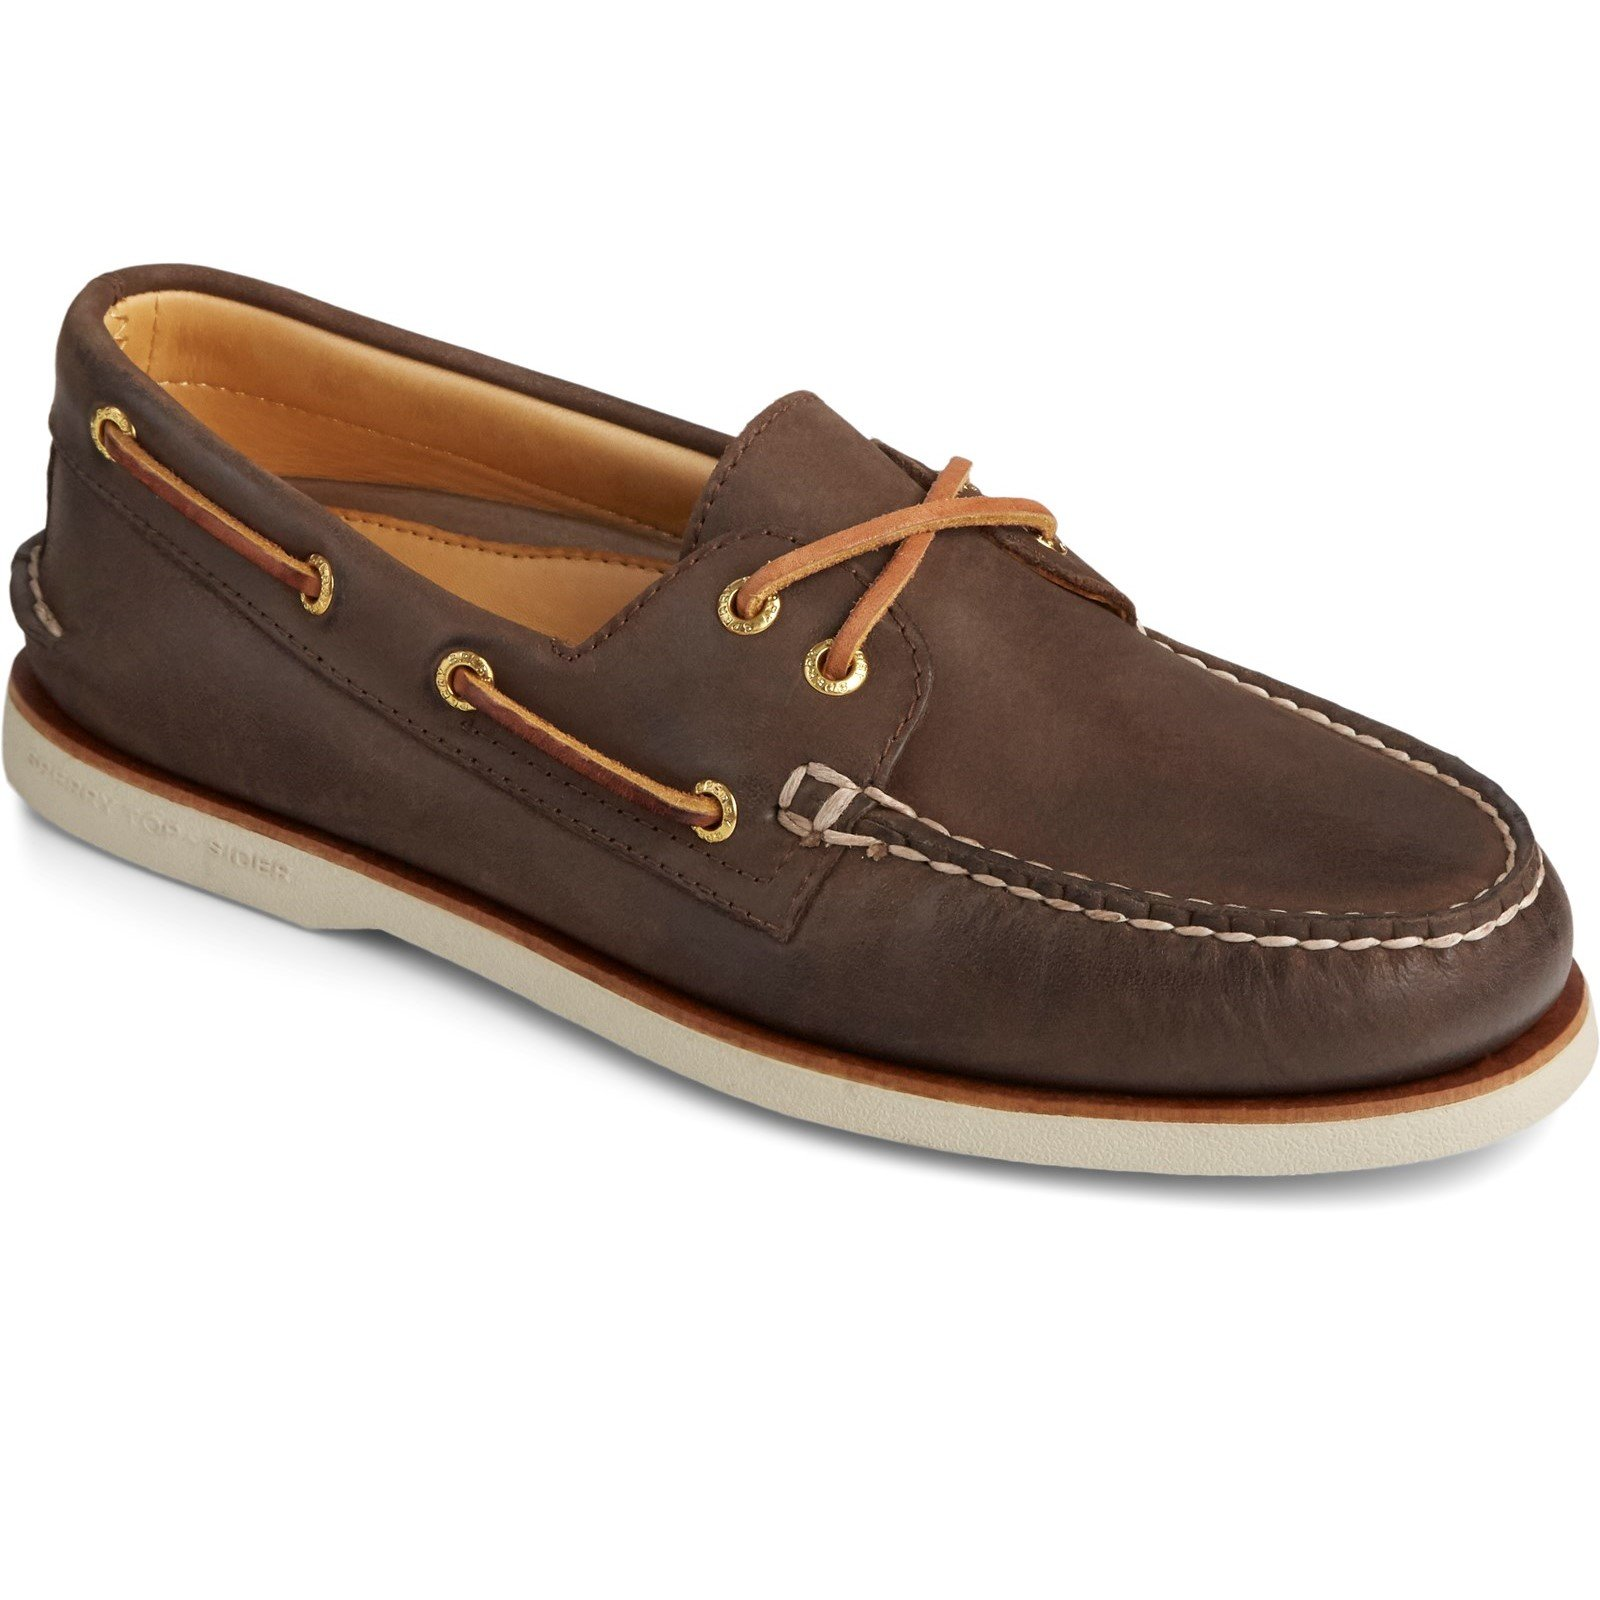 Sperry Men's Cup Authentic Original Boat Shoe Various Colours 31735 - Brown 10